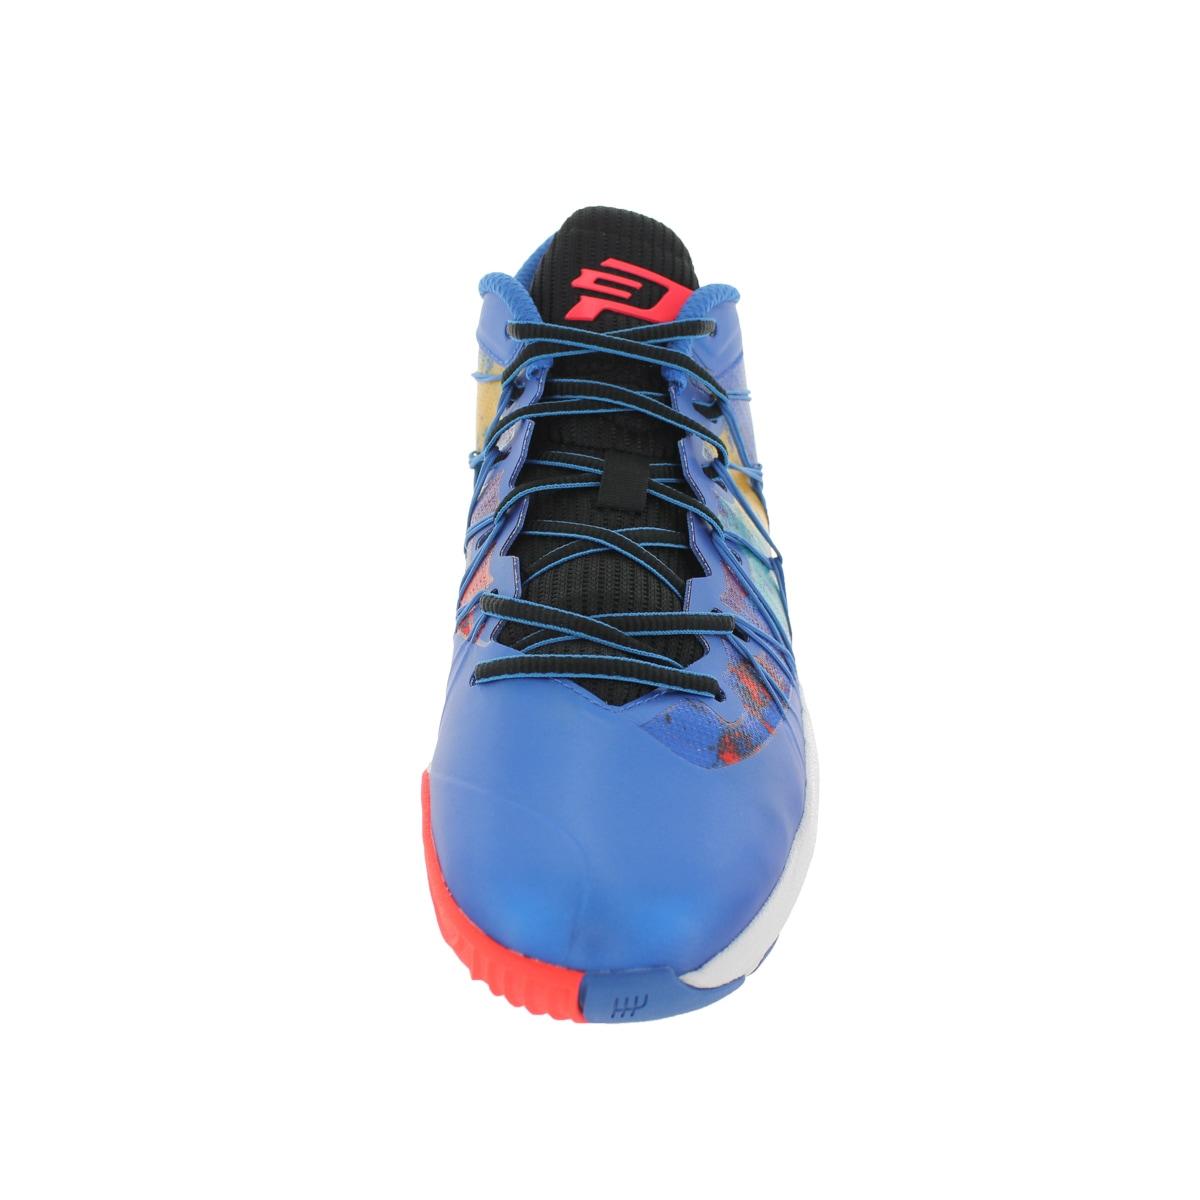 sports shoes 1bd76 03533 Shop Nike Jordan Men s Jordan Cp3.Vii Ae Sprt Bl Black Lsr Purple Basketball  Shoe - Free Shipping Today - Overstock - 12318643